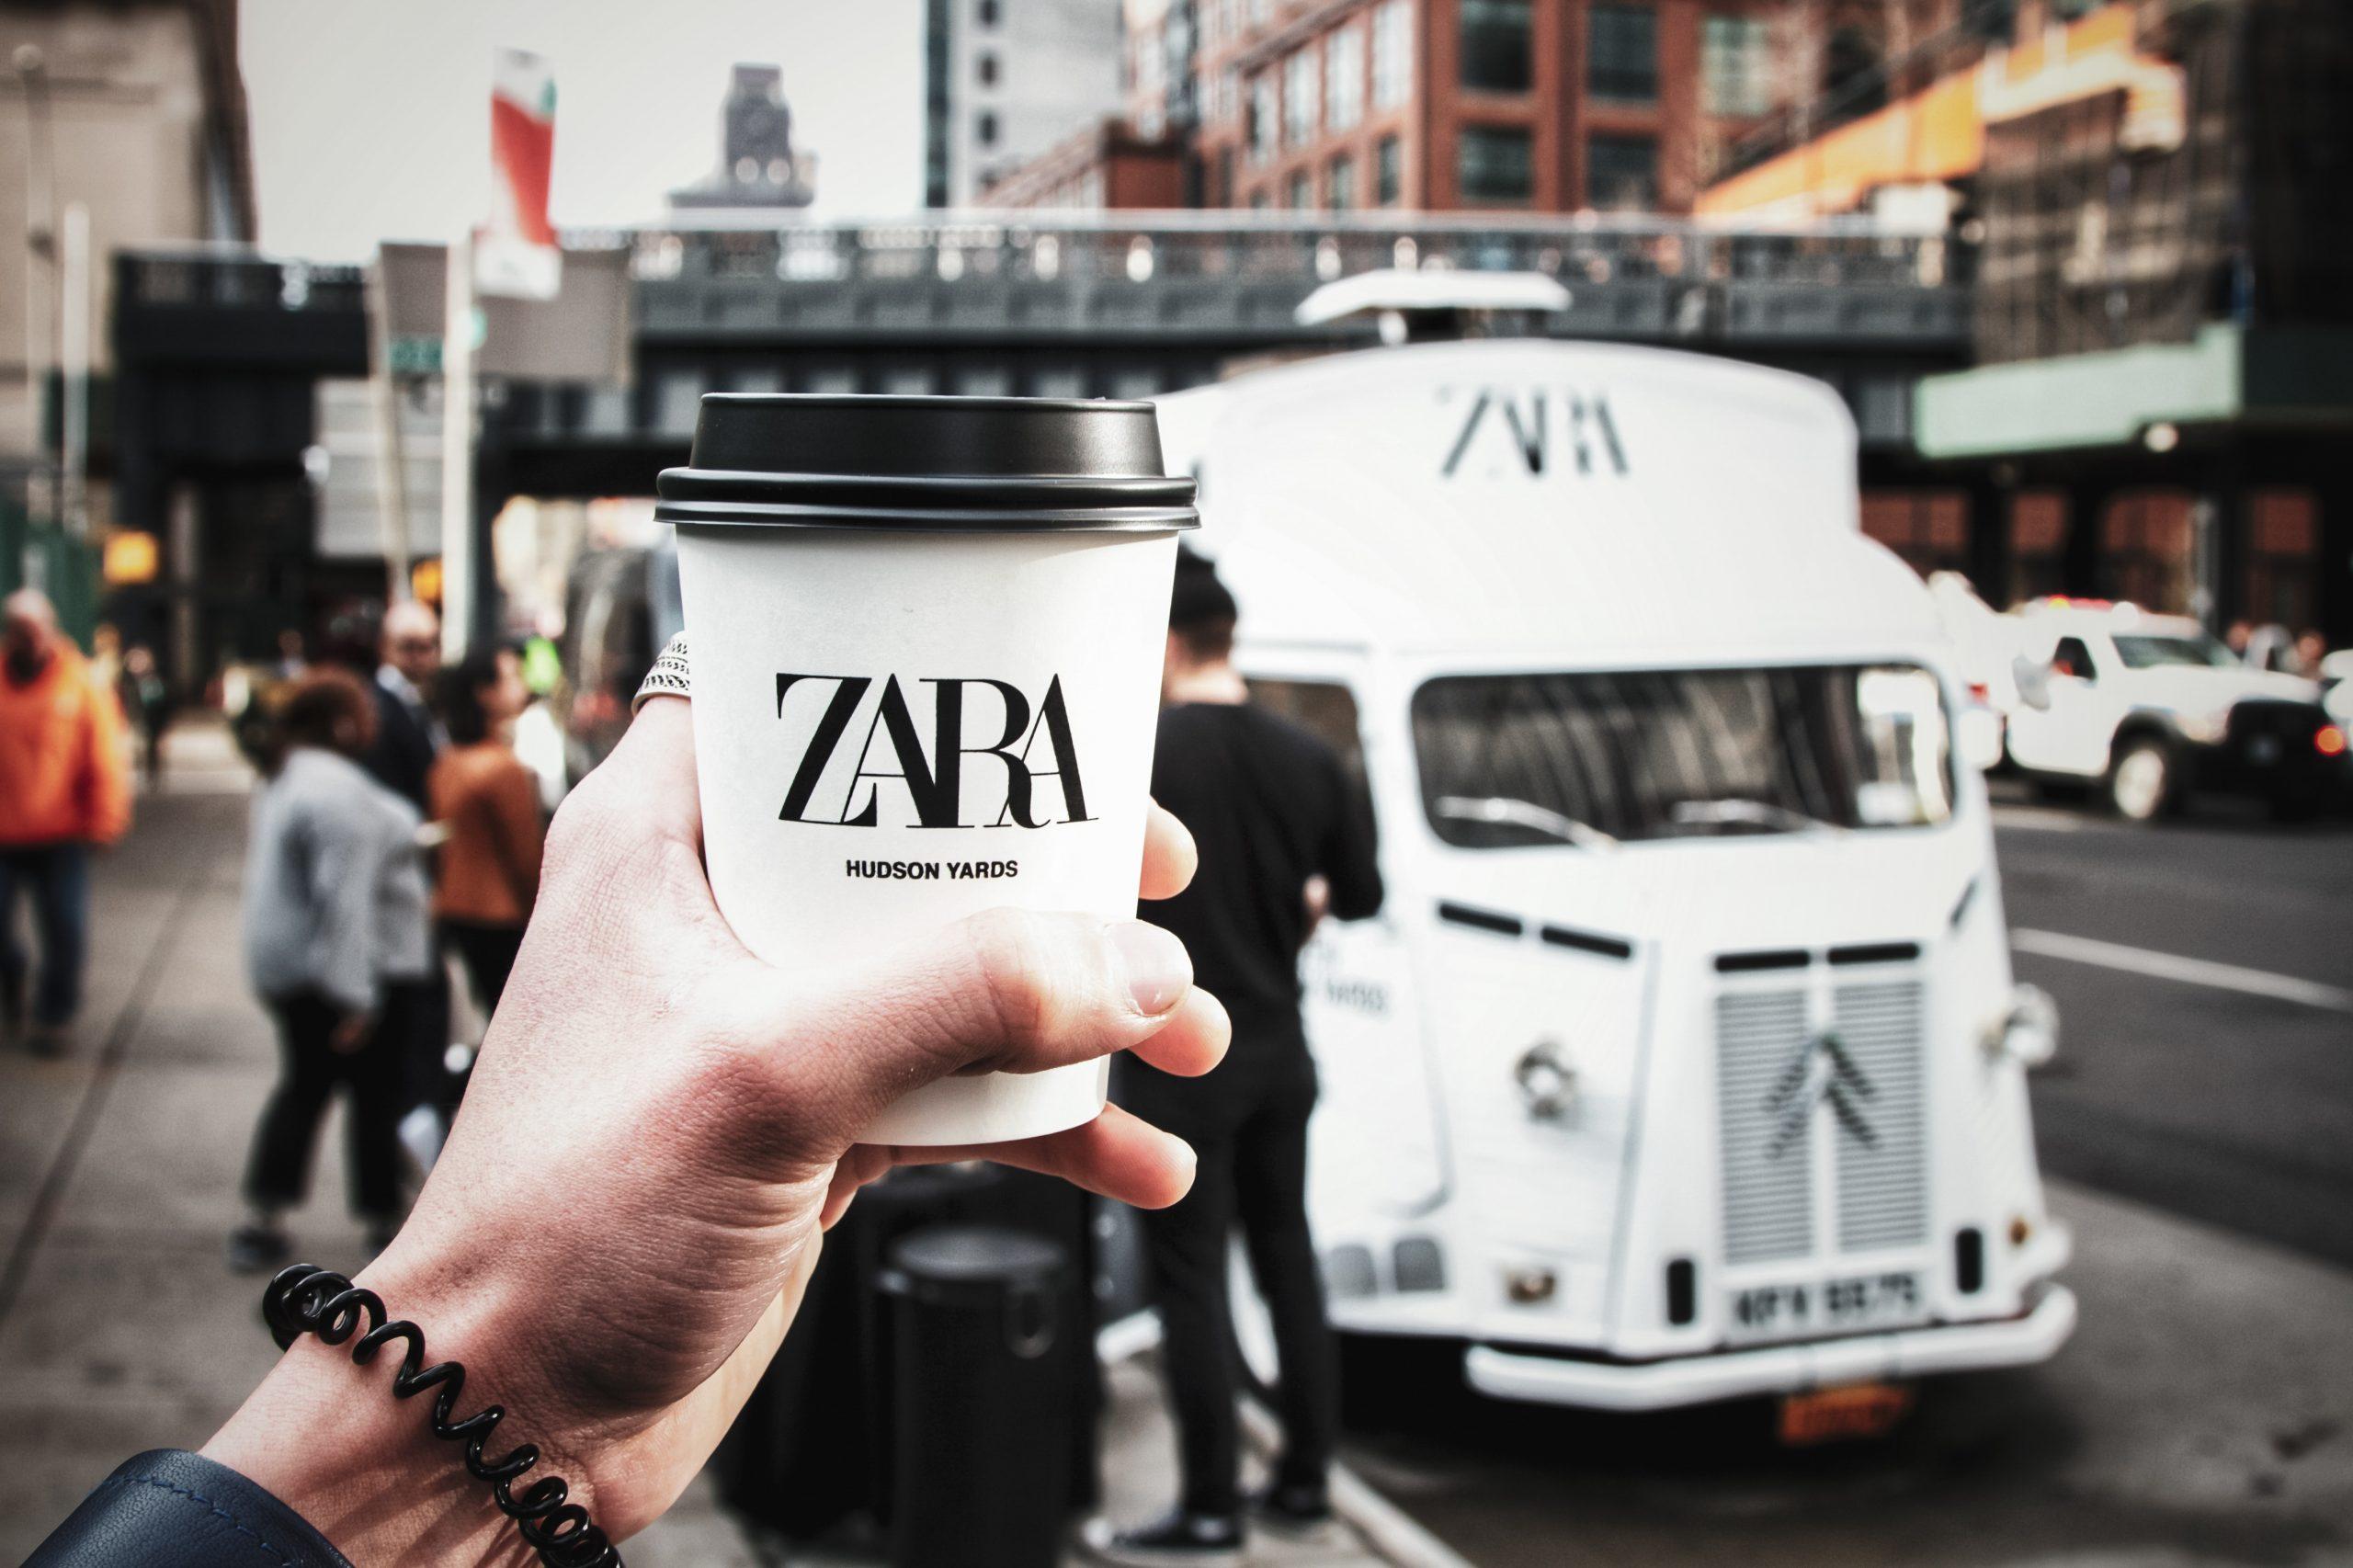 Zara Hudson Yards Coffee Pop-Up